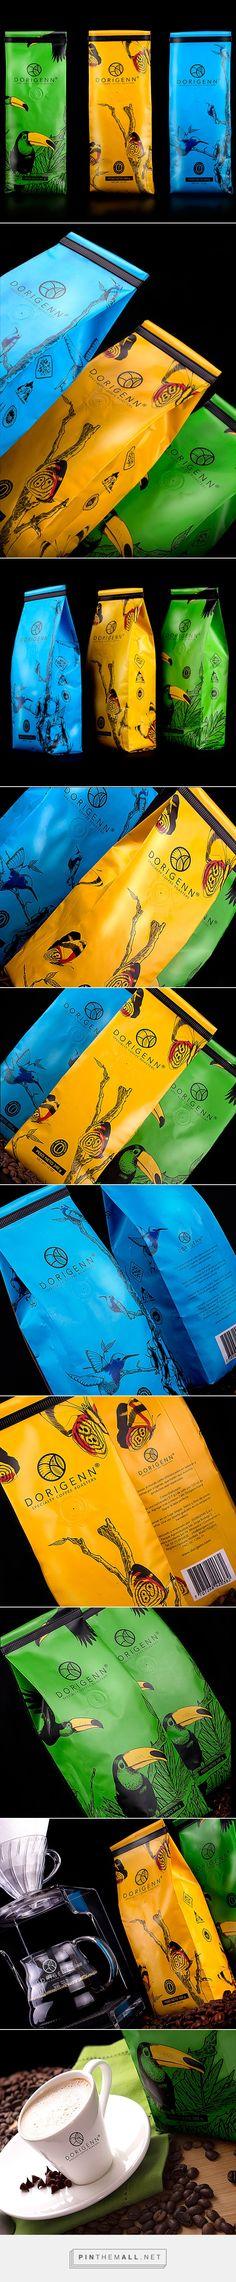 Dorigenn Coffee Packaging  by David Espinosa IDS